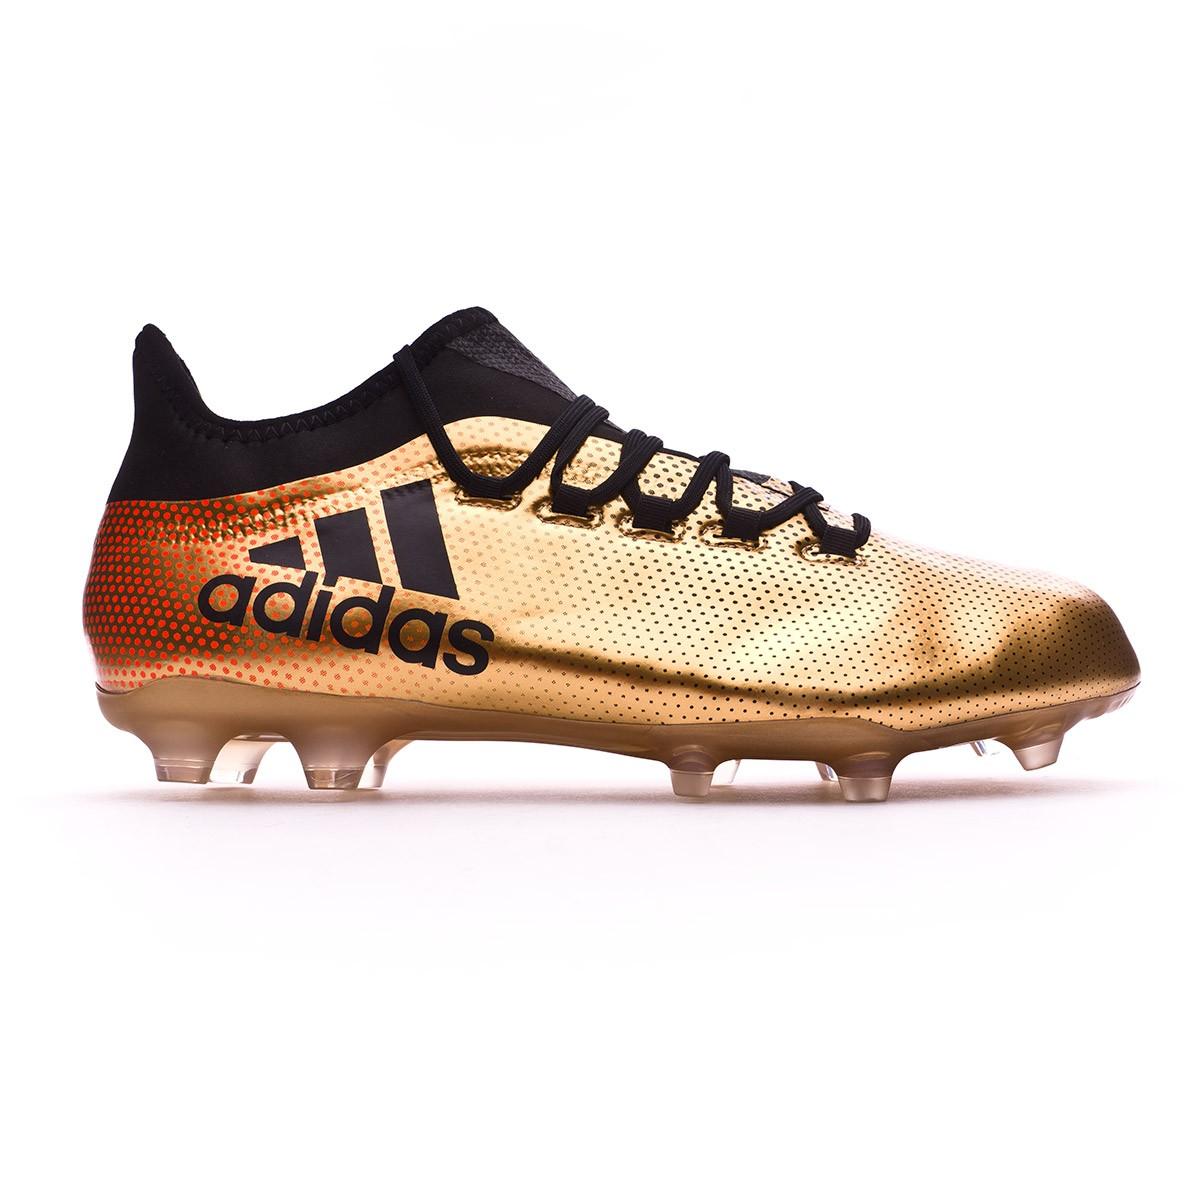 f9471e9ae Football Boots adidas X 17.2 FG Tactile gold metallic-Core black-Solar red  - Football store Fútbol Emotion